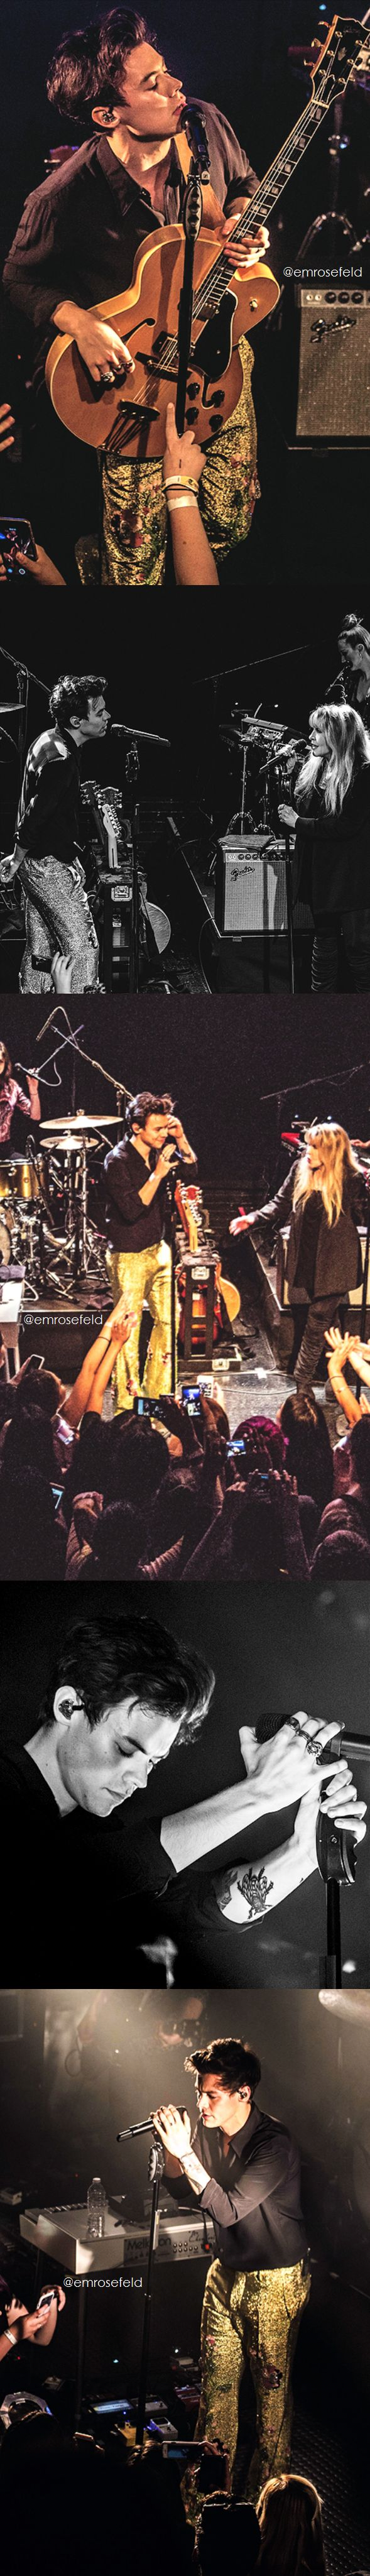 Harry Styles and Stevie Nicks | at the Troubadour 5.19.17 | emrosefeld |